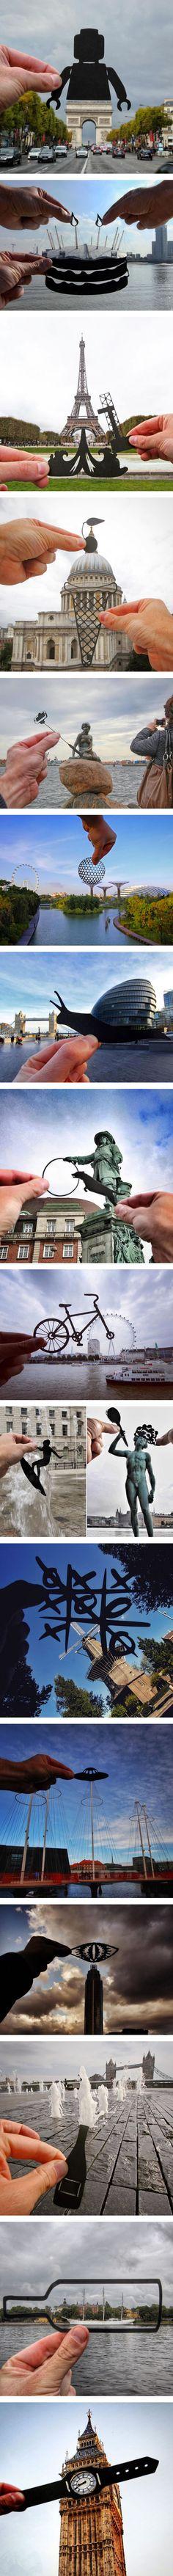 Photographer Transforms Landmarks Using Paper Cutouts